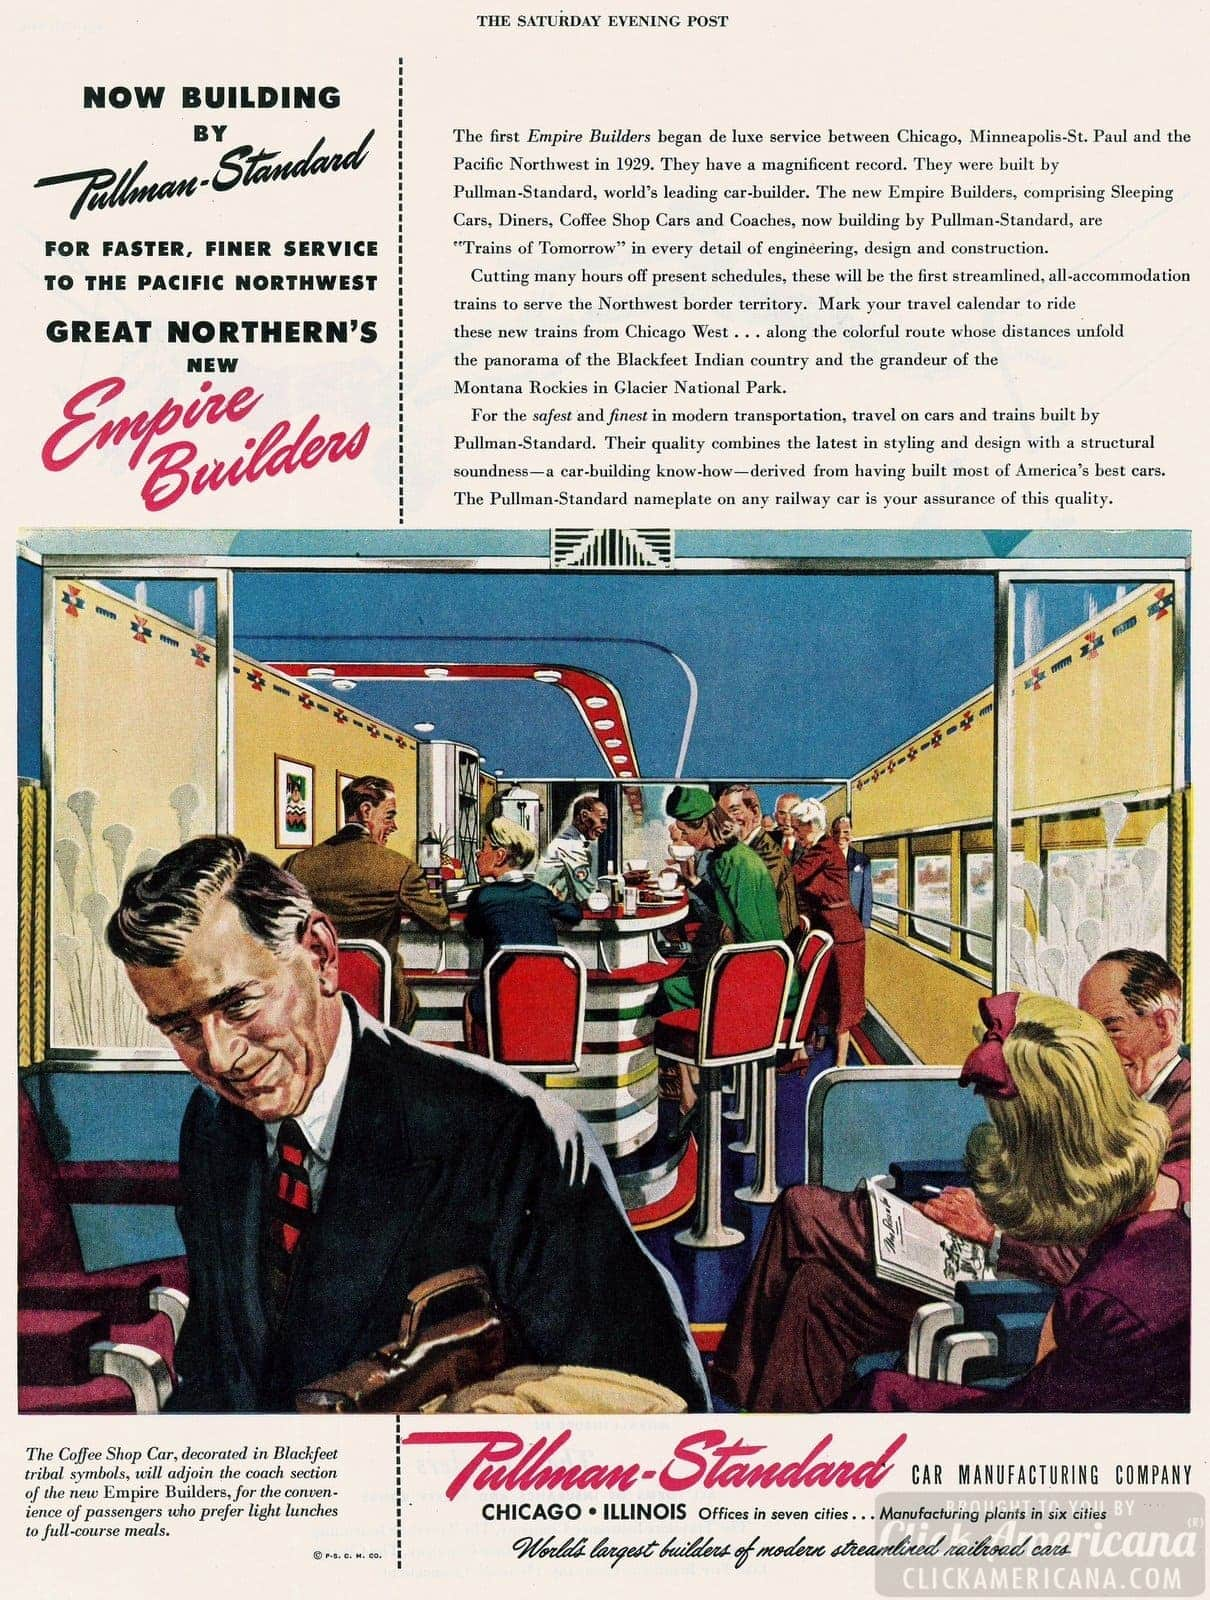 Railroad - 1946 Pullman-Standard Great Northern Empire Builders - Diner